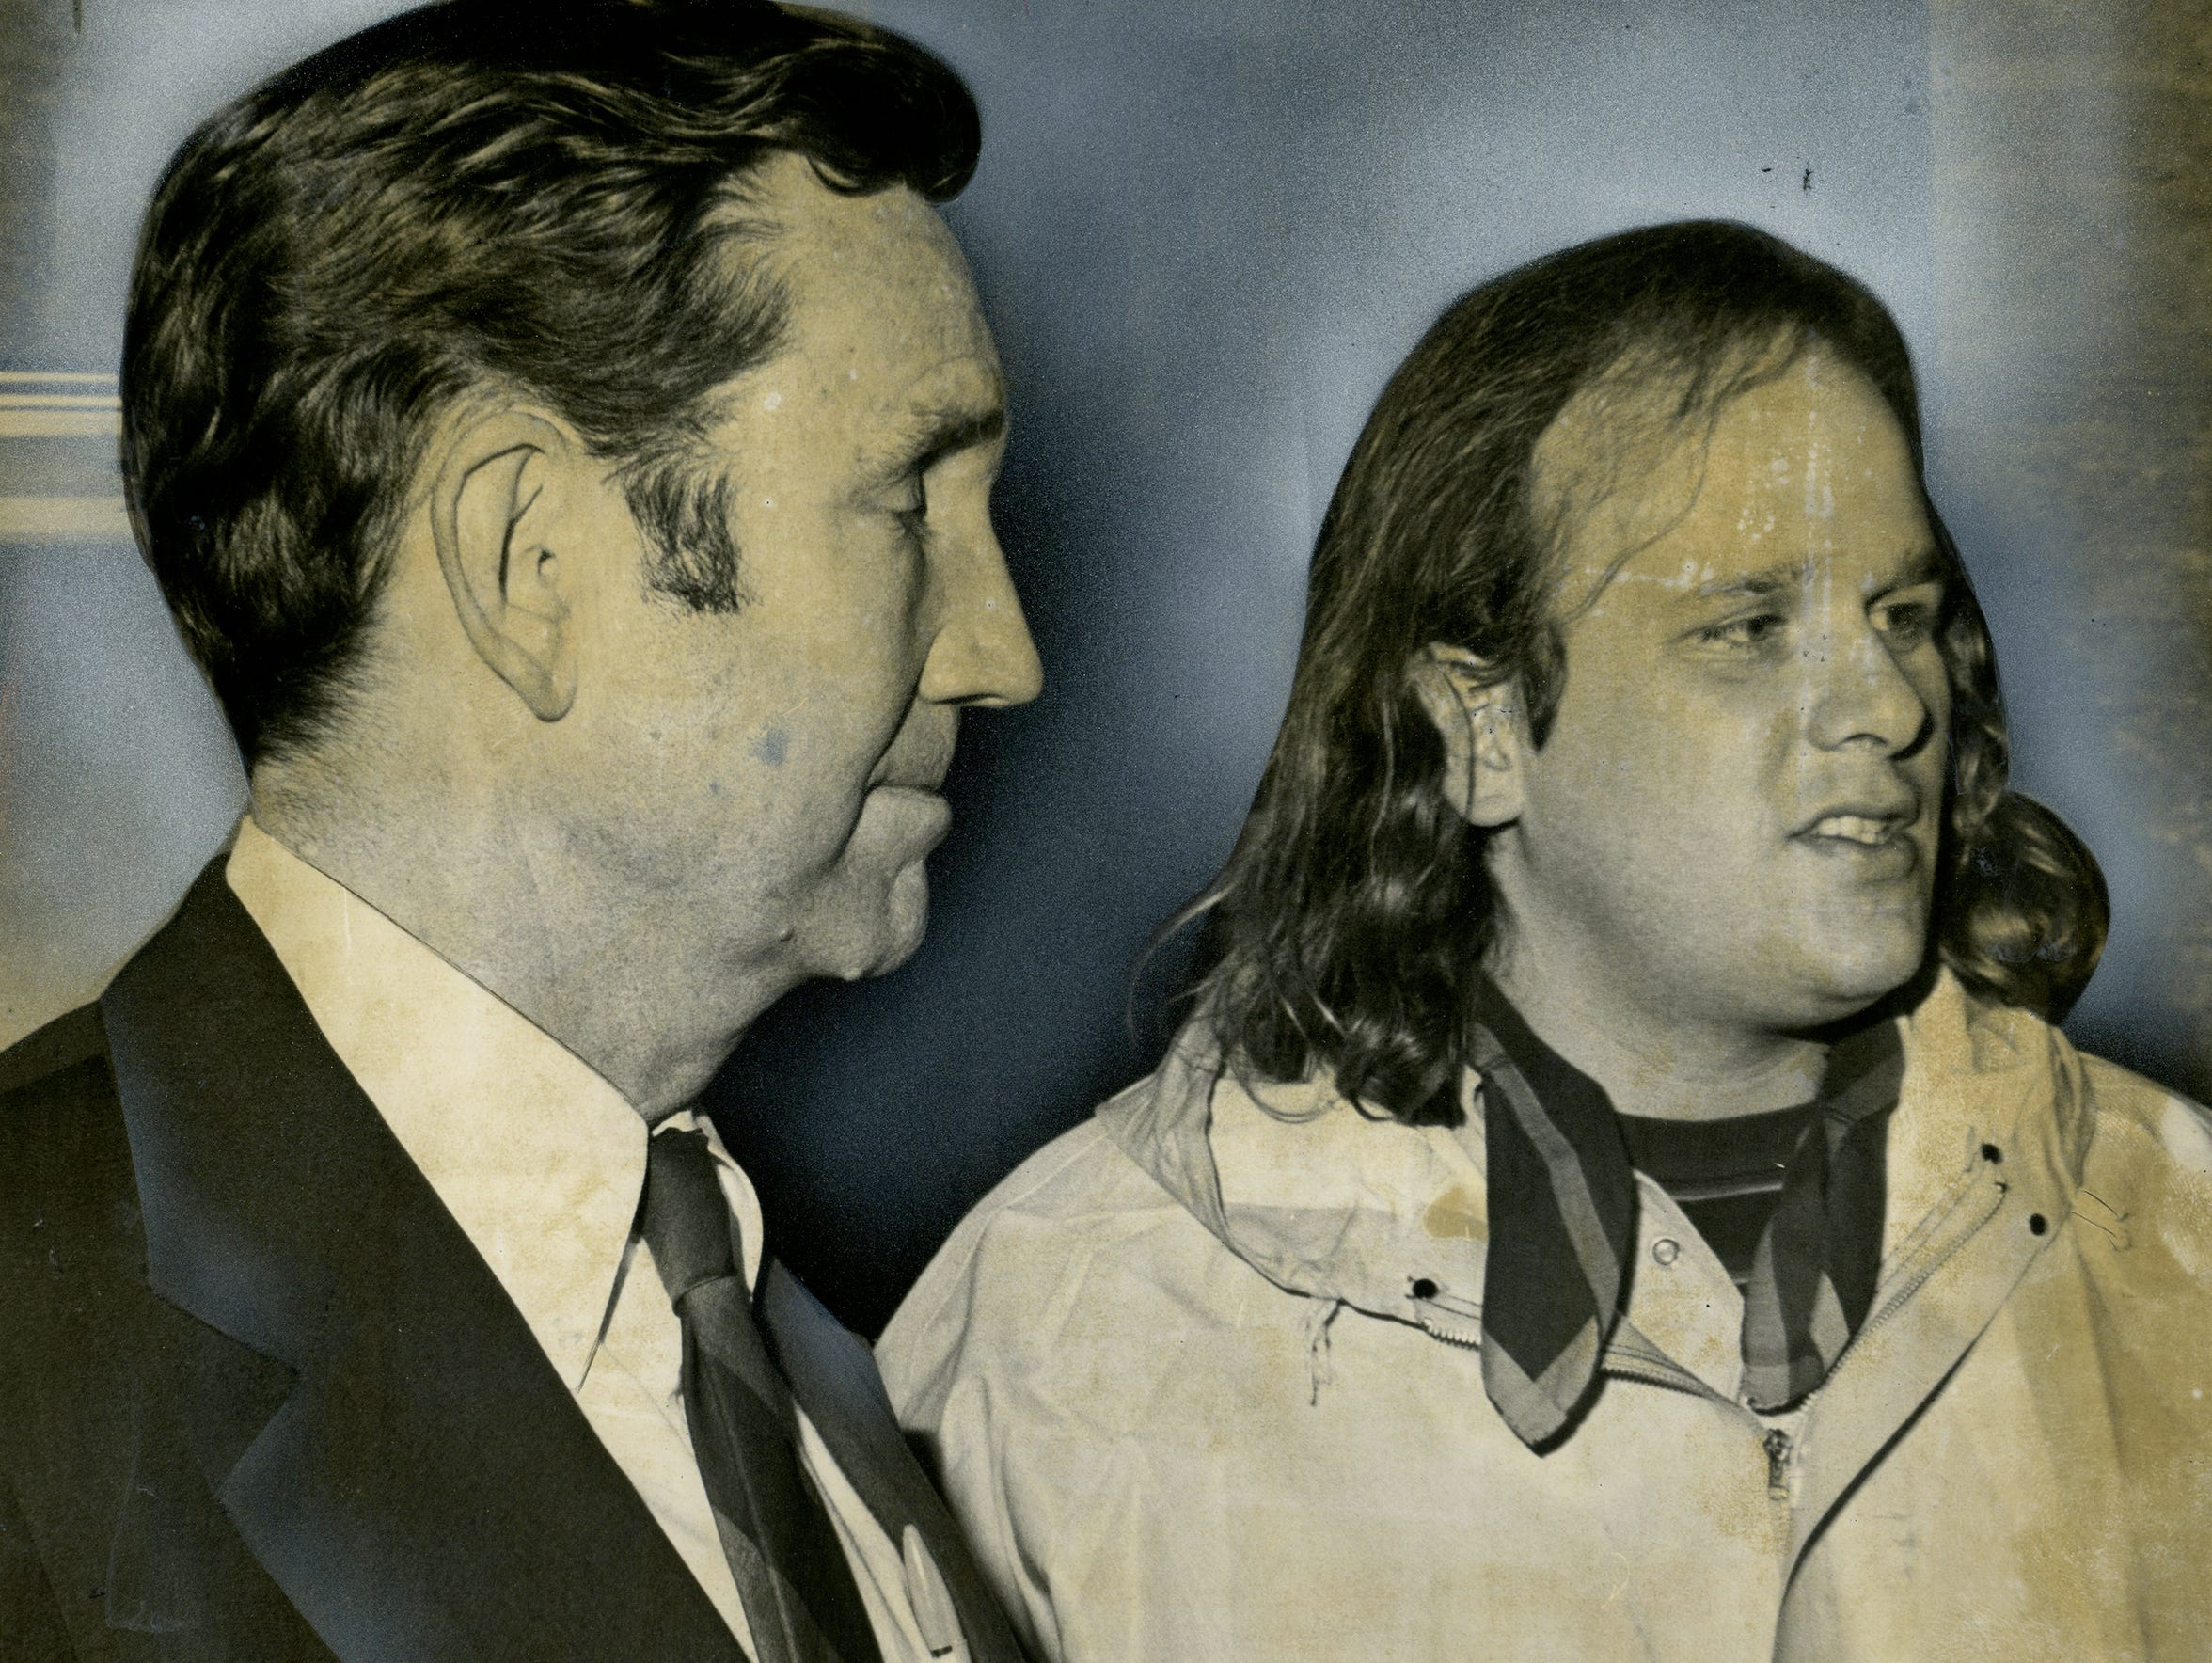 Former attorney general Ramsey Clark, left, accompanies